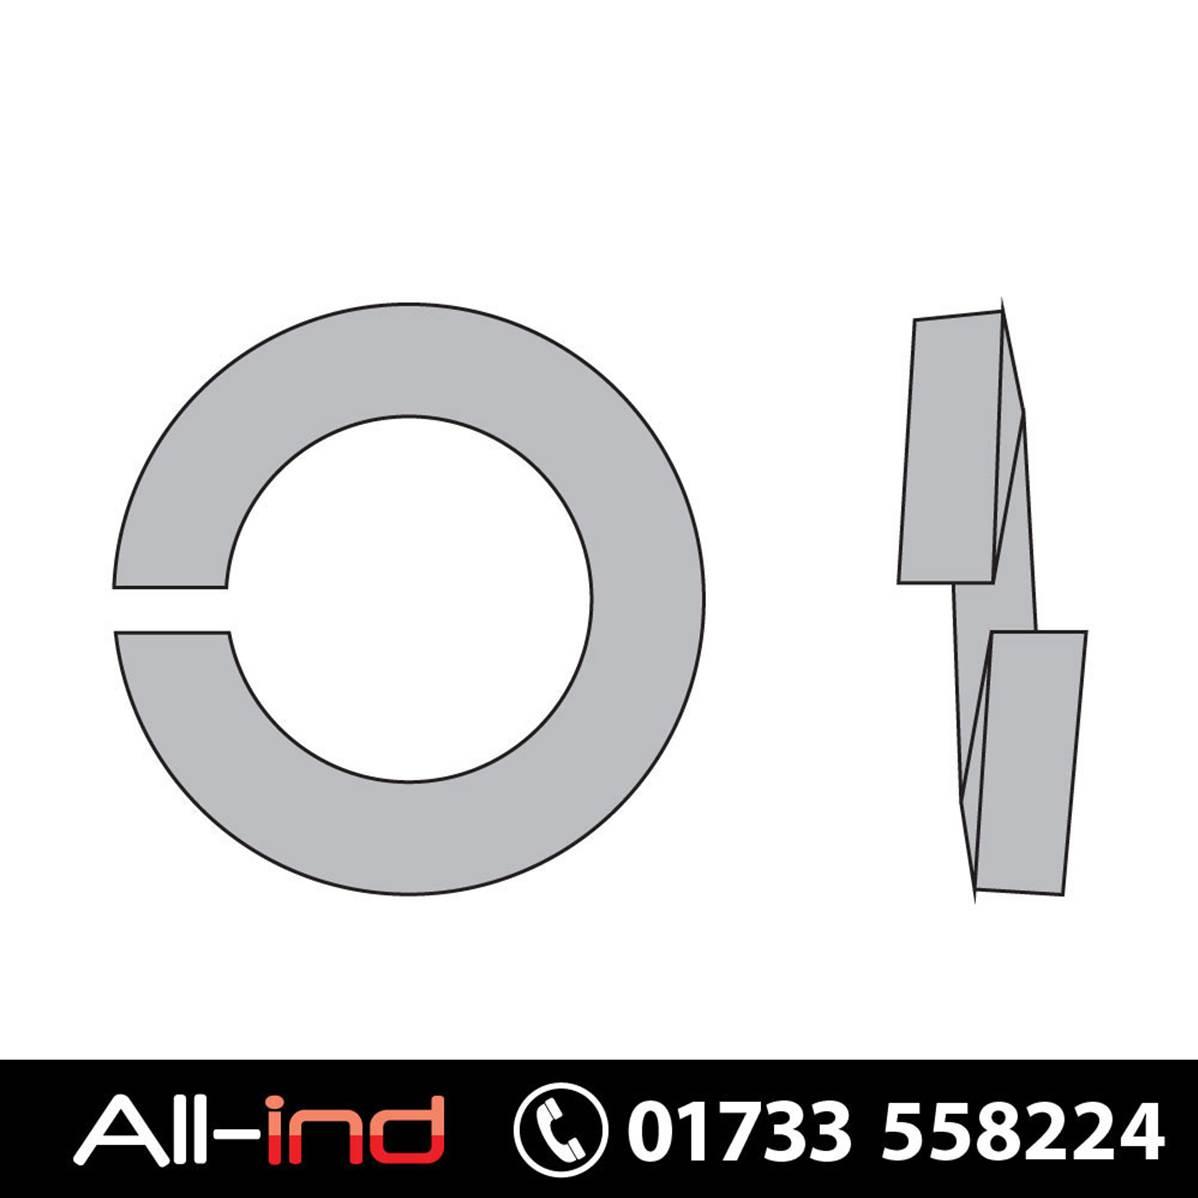 [100] M10 SPRING WASHER DIN7980 BS4464